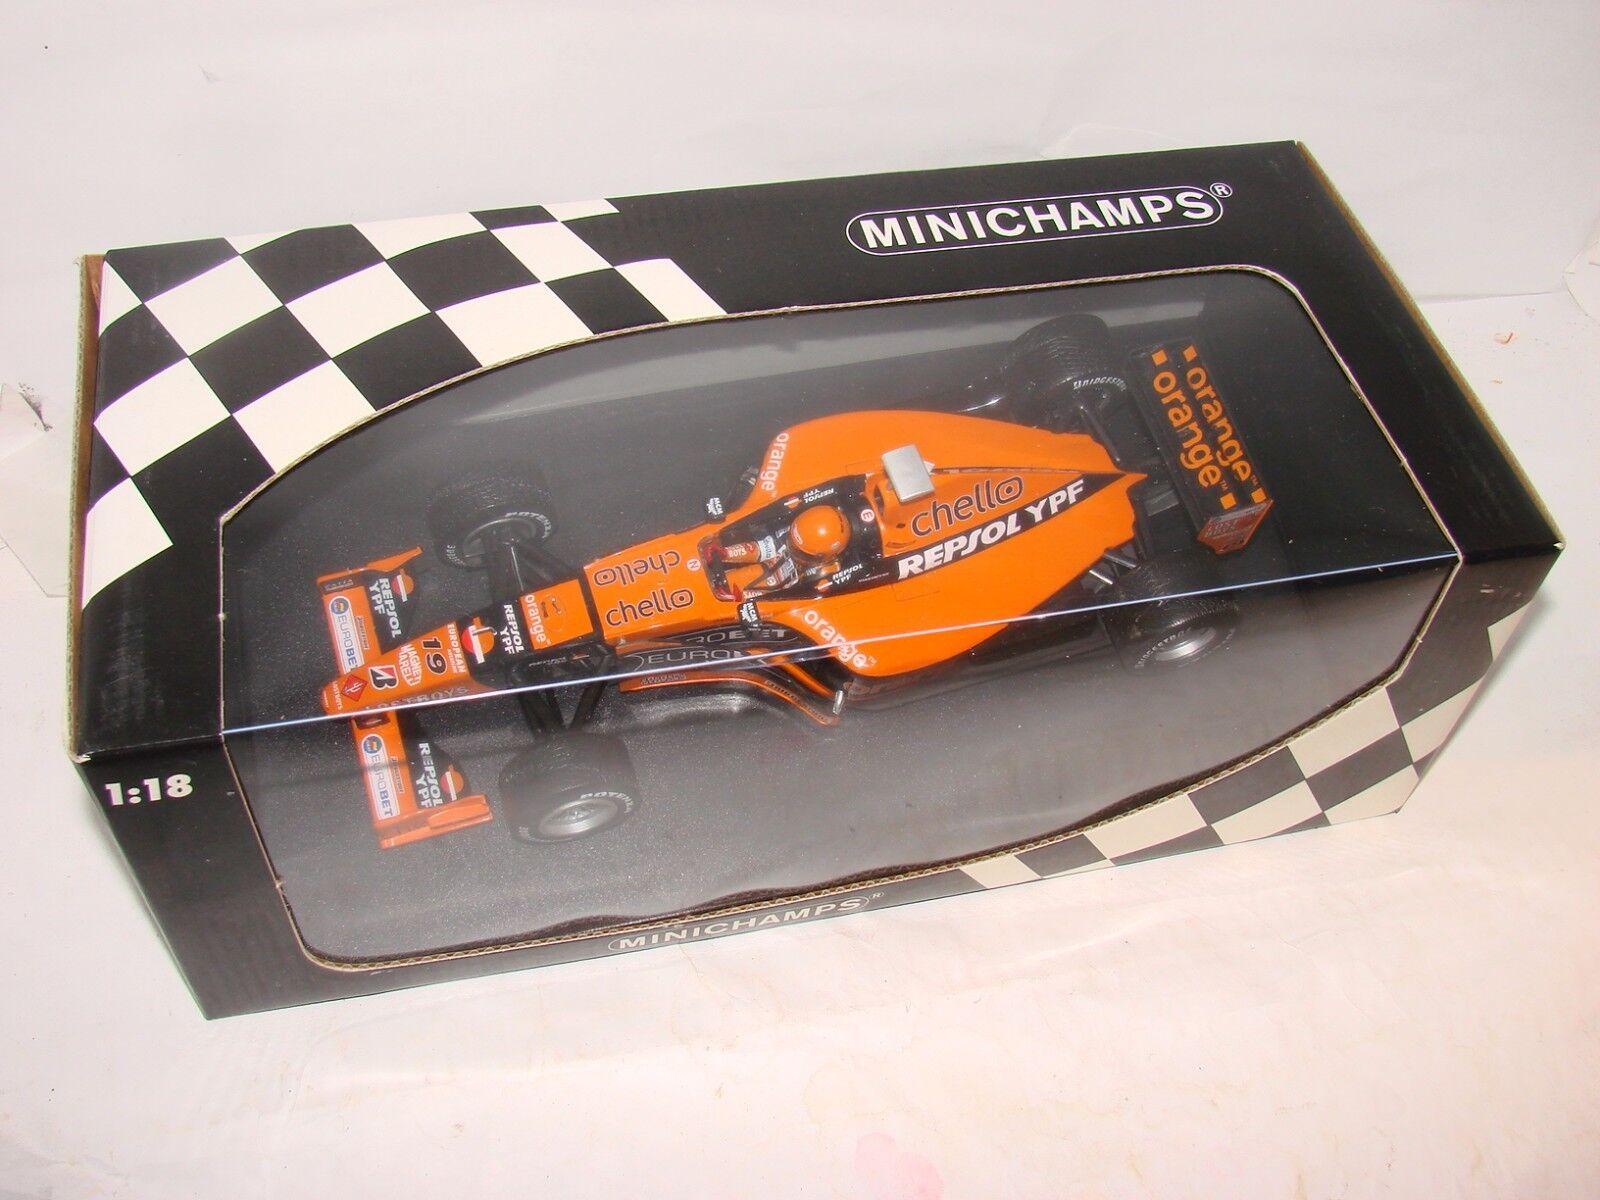 Minichamps flechas A21, Verstappen neumáticos de lluvia, Canadá Grand Prix 2018